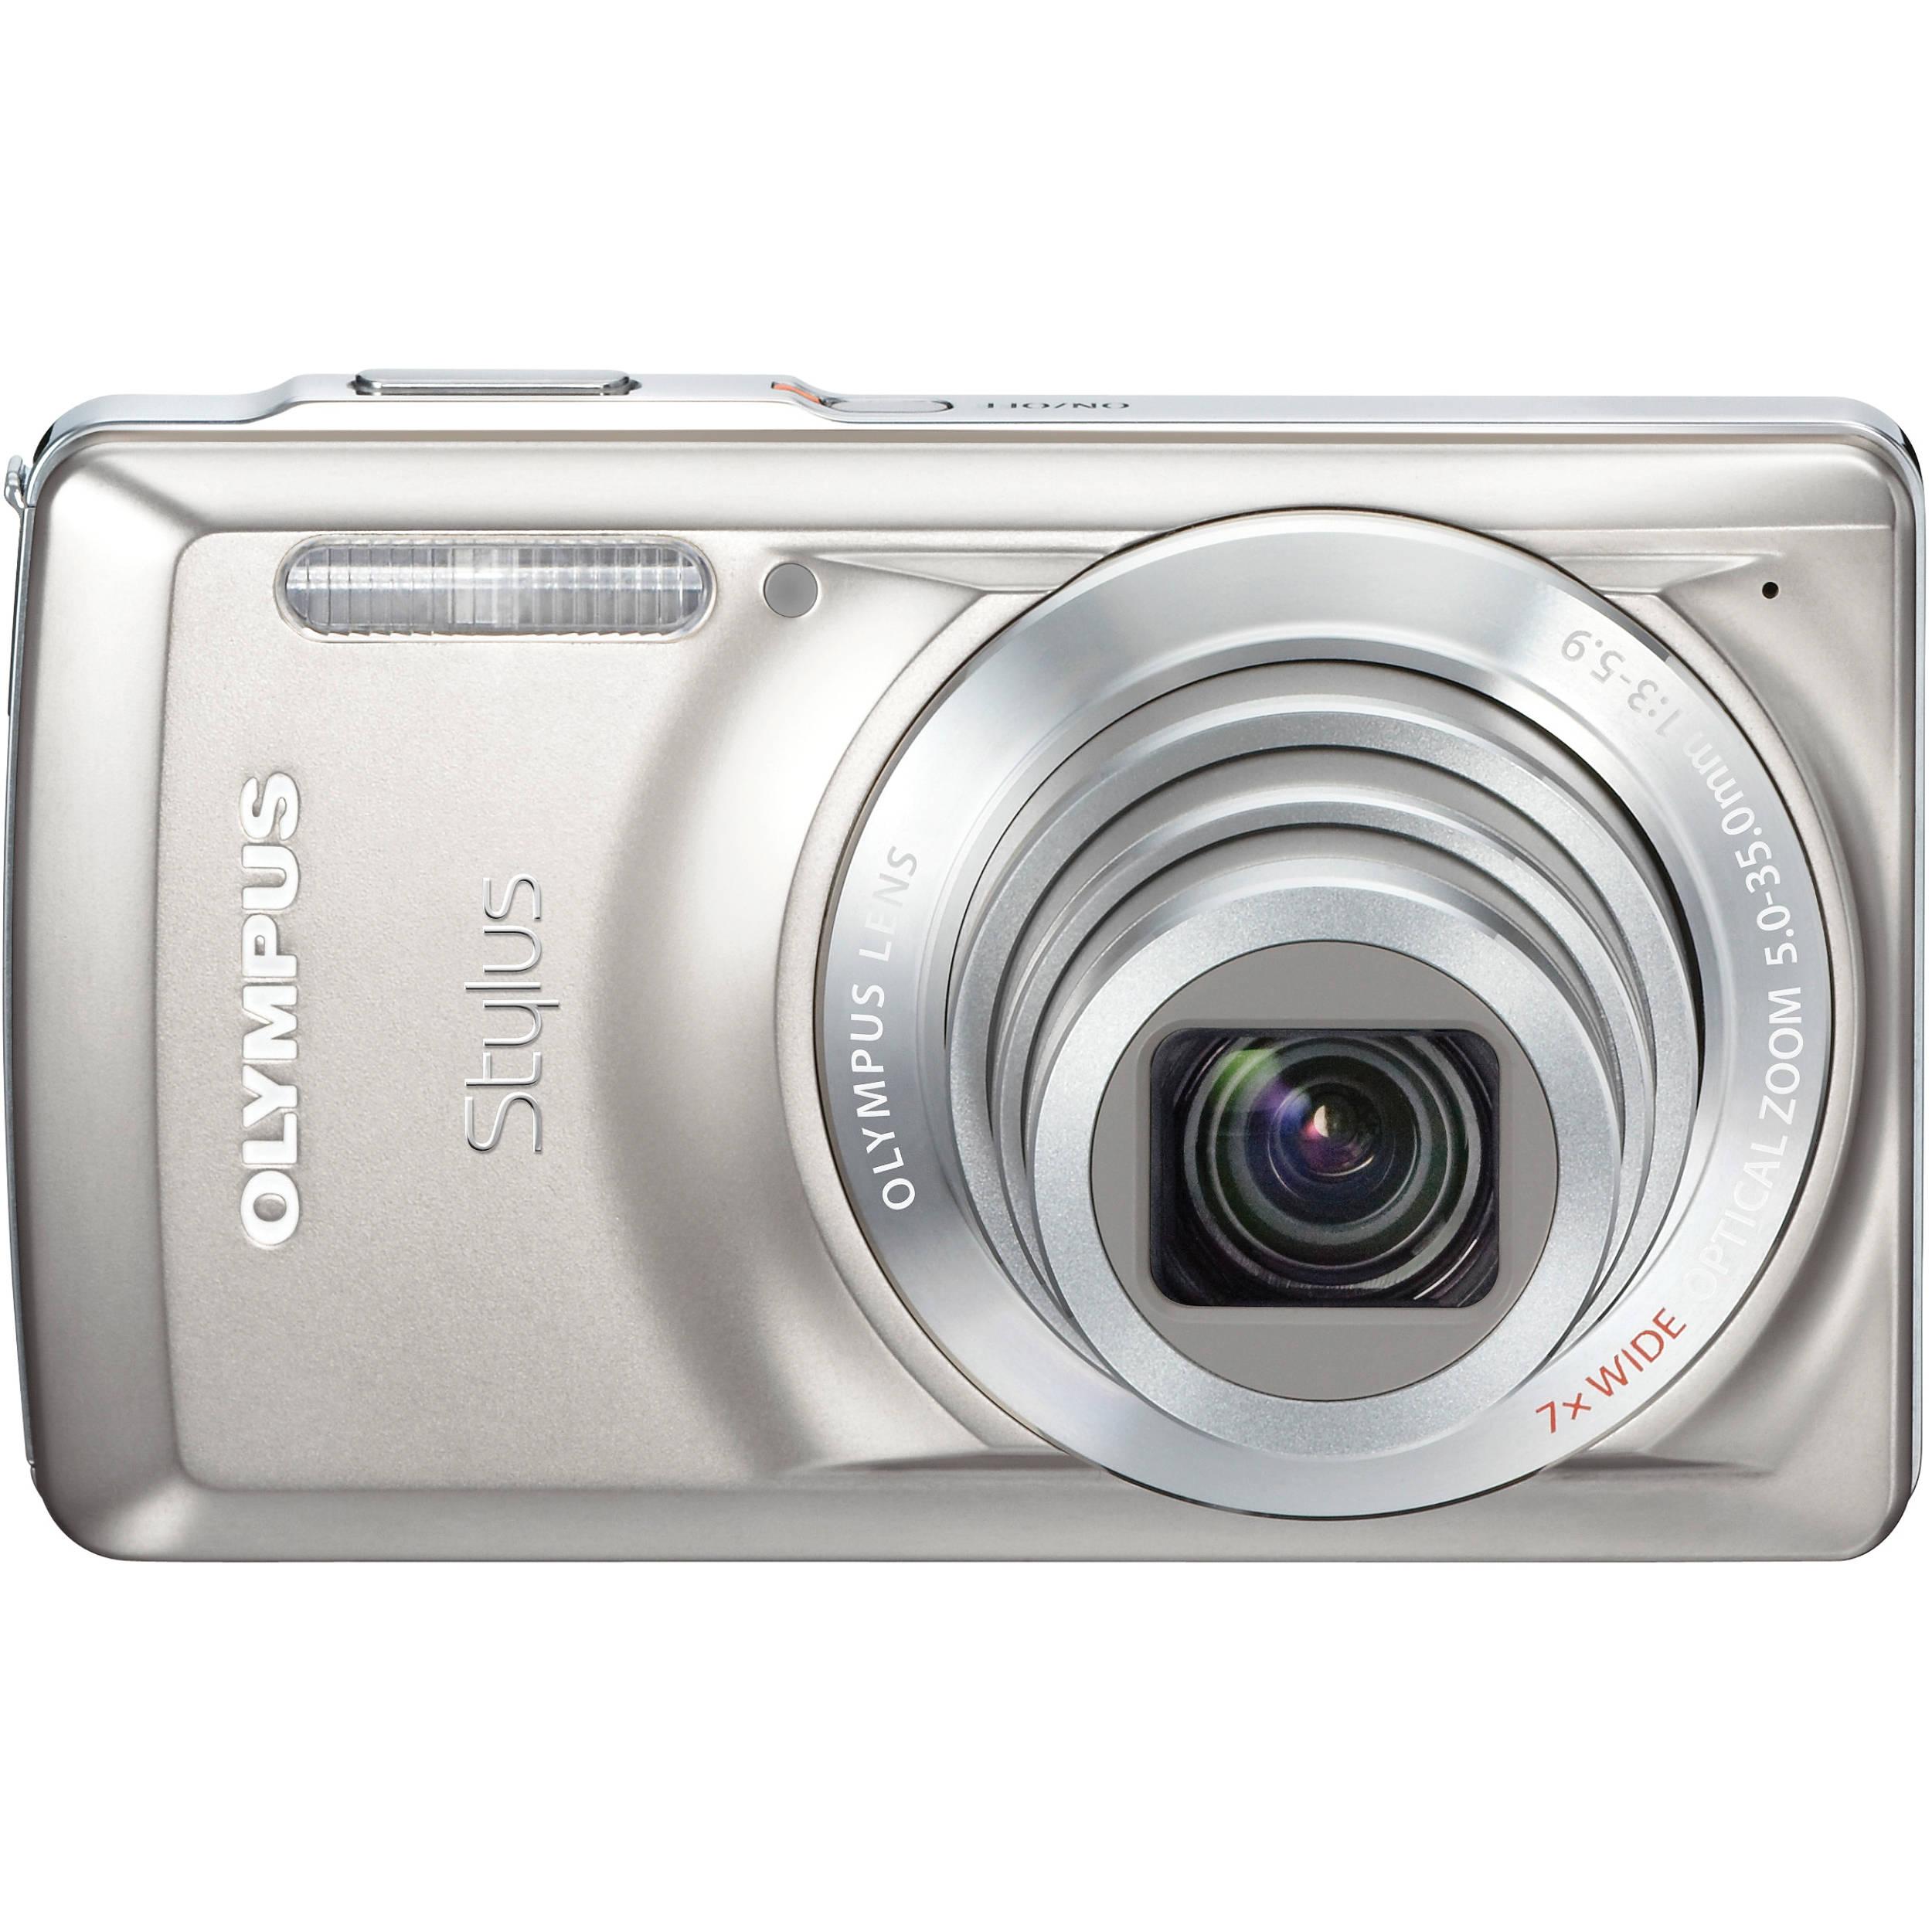 olympus stylus 7030 digital camera titanium 227585 b h photo rh bhphotovideo com olympus stylus 7000 manual Olympus Stylus TG-830